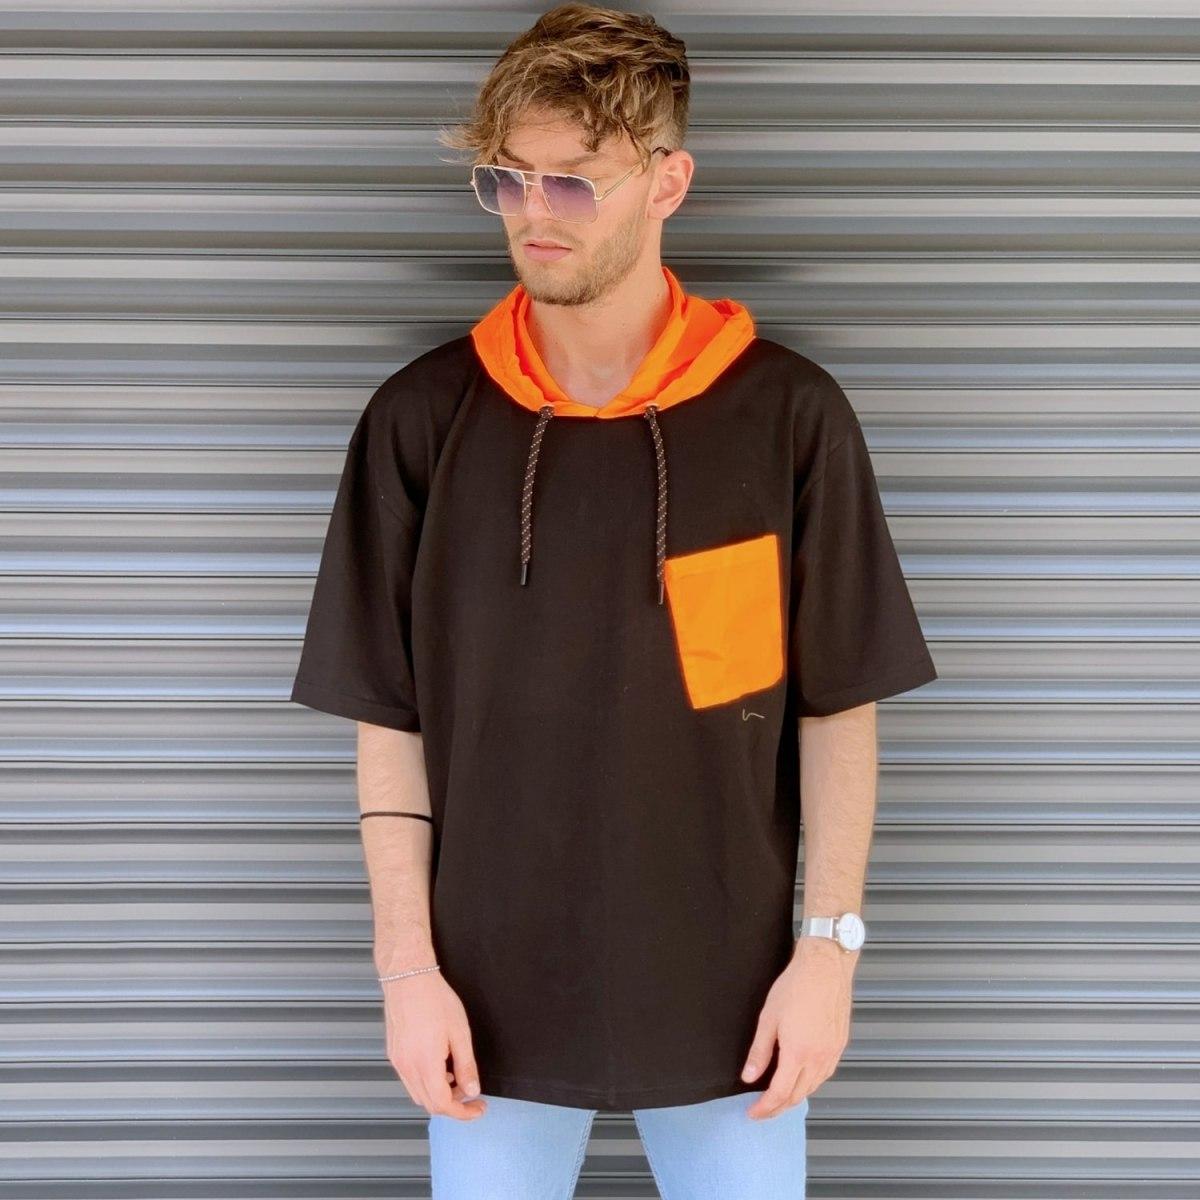 Men's Oversized T-Shirt With Orange Hood In Brown Mv Premium Brand - 1